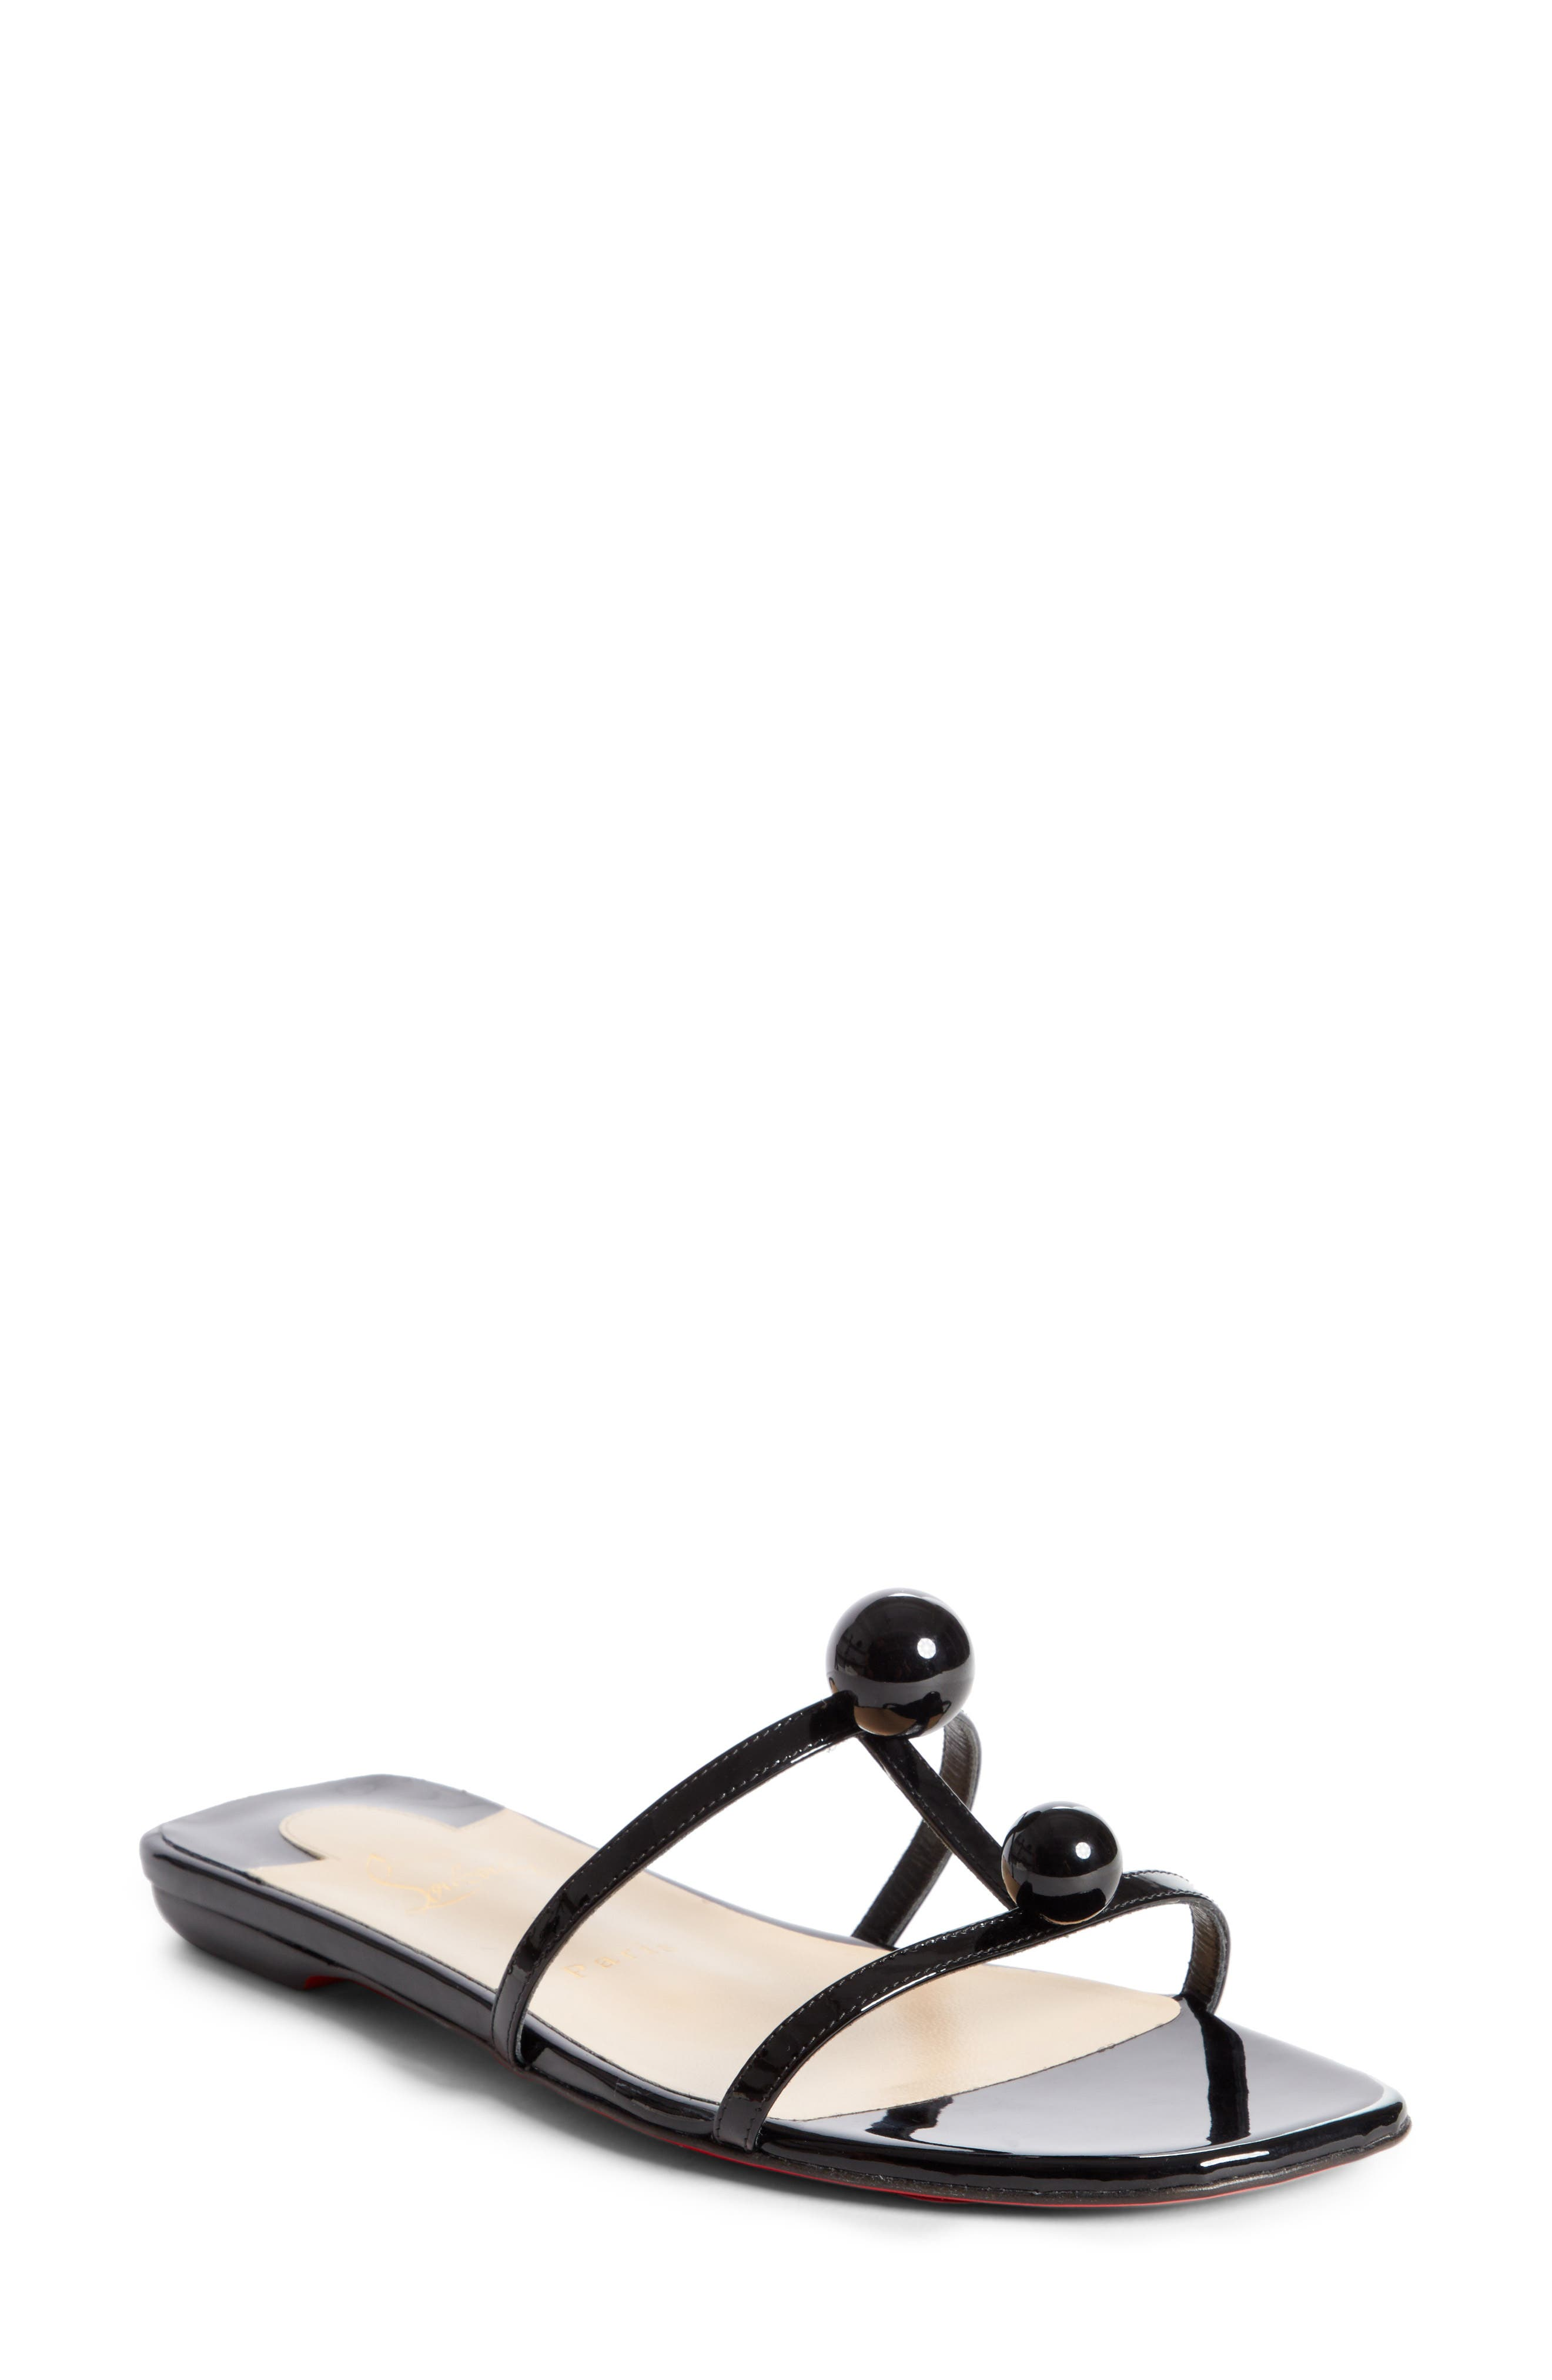 Atonetta Ornament Slide Sandal,                         Main,                         color, 003